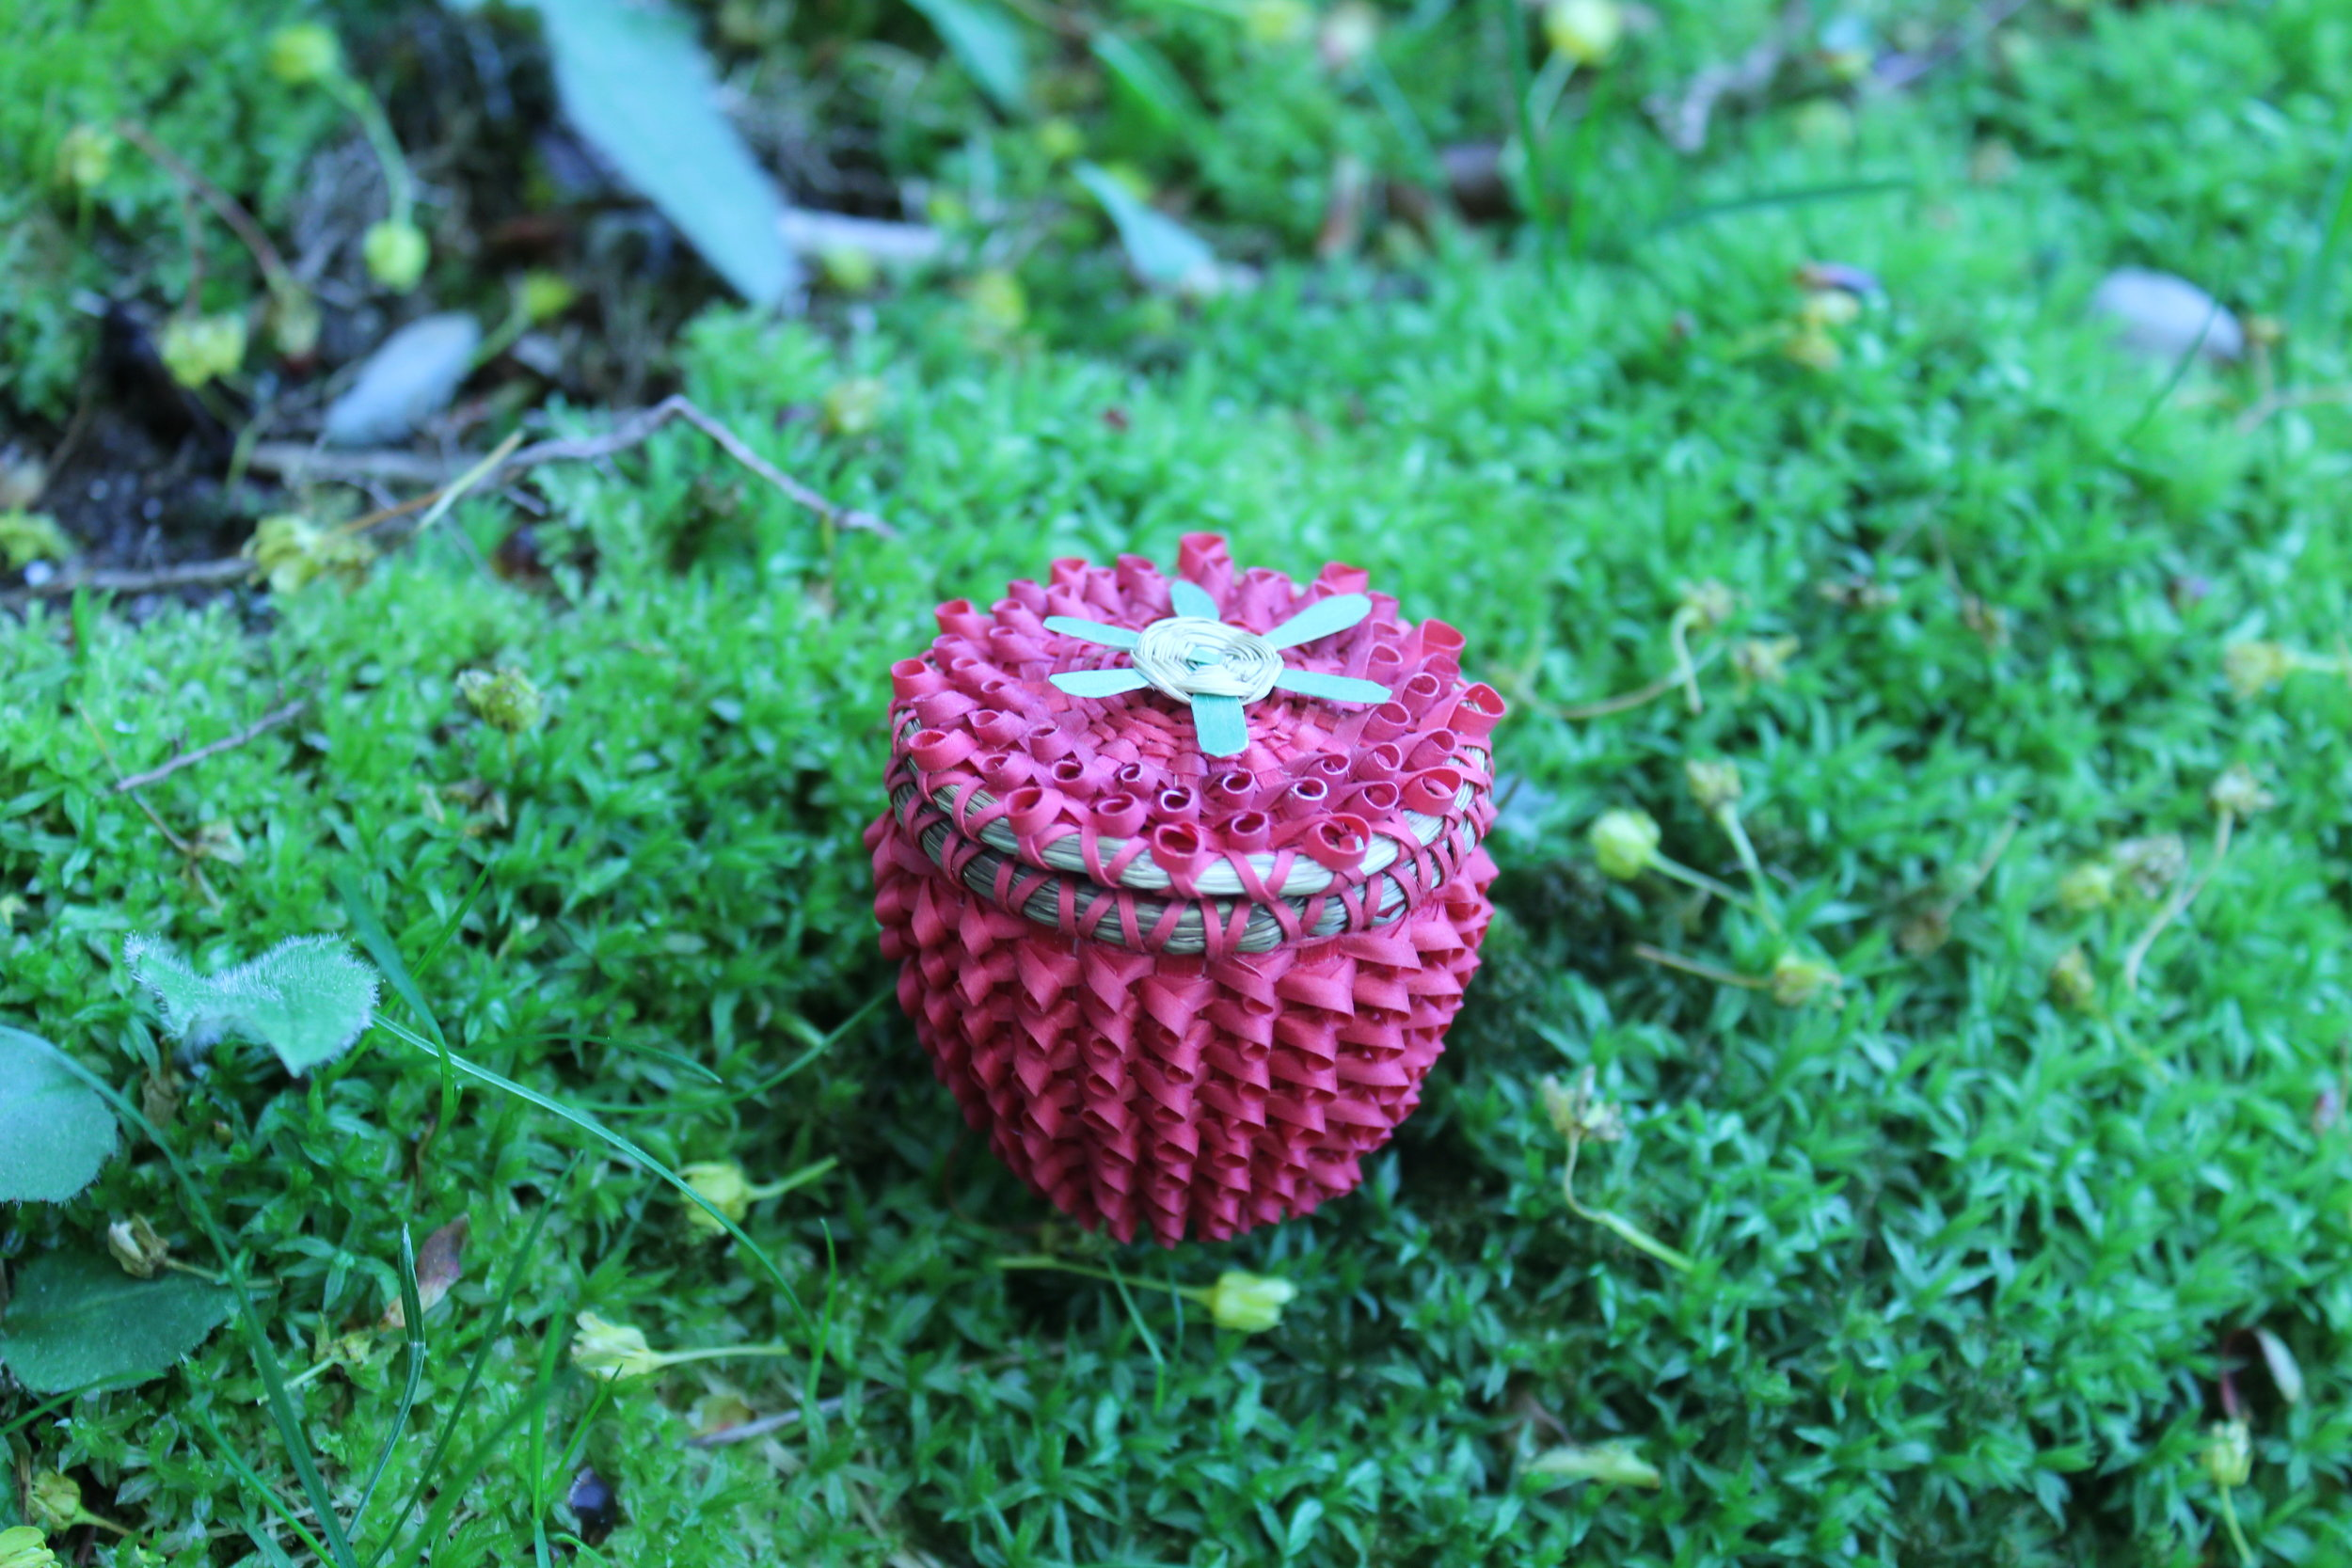 Strawberry Basket 1.JPG